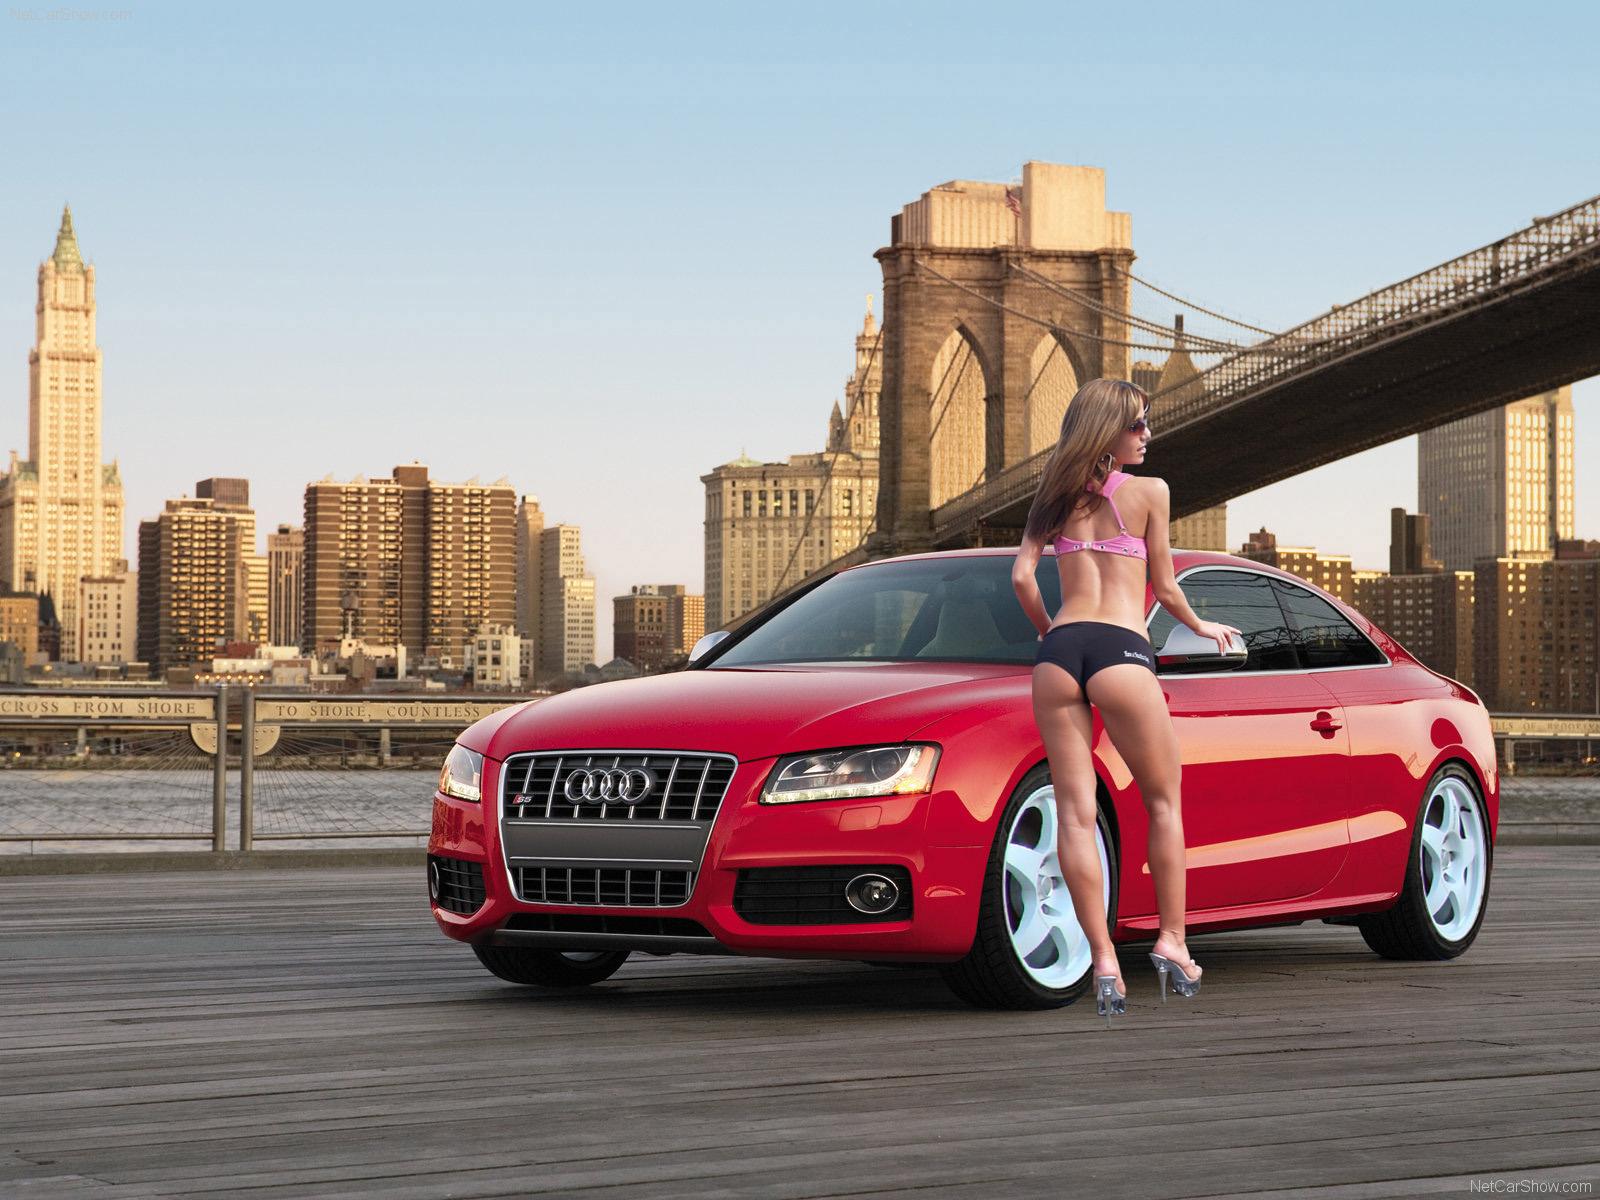 Audi s5 HD Wallpaper Download 1600x1200